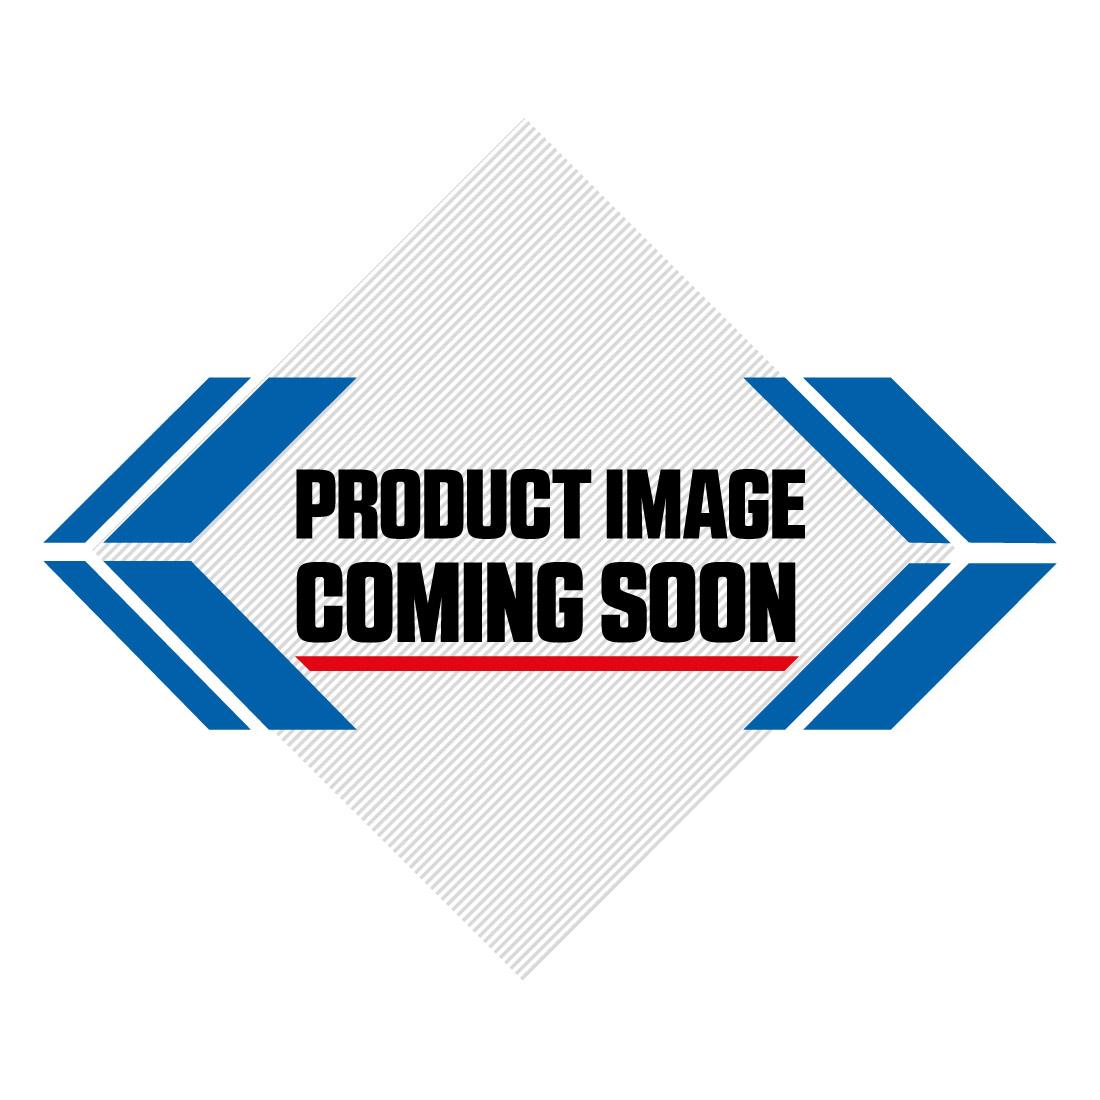 Kawasaki Restyled Plastic Kit KX 85 (01-09) (11-12) Black Image-4>